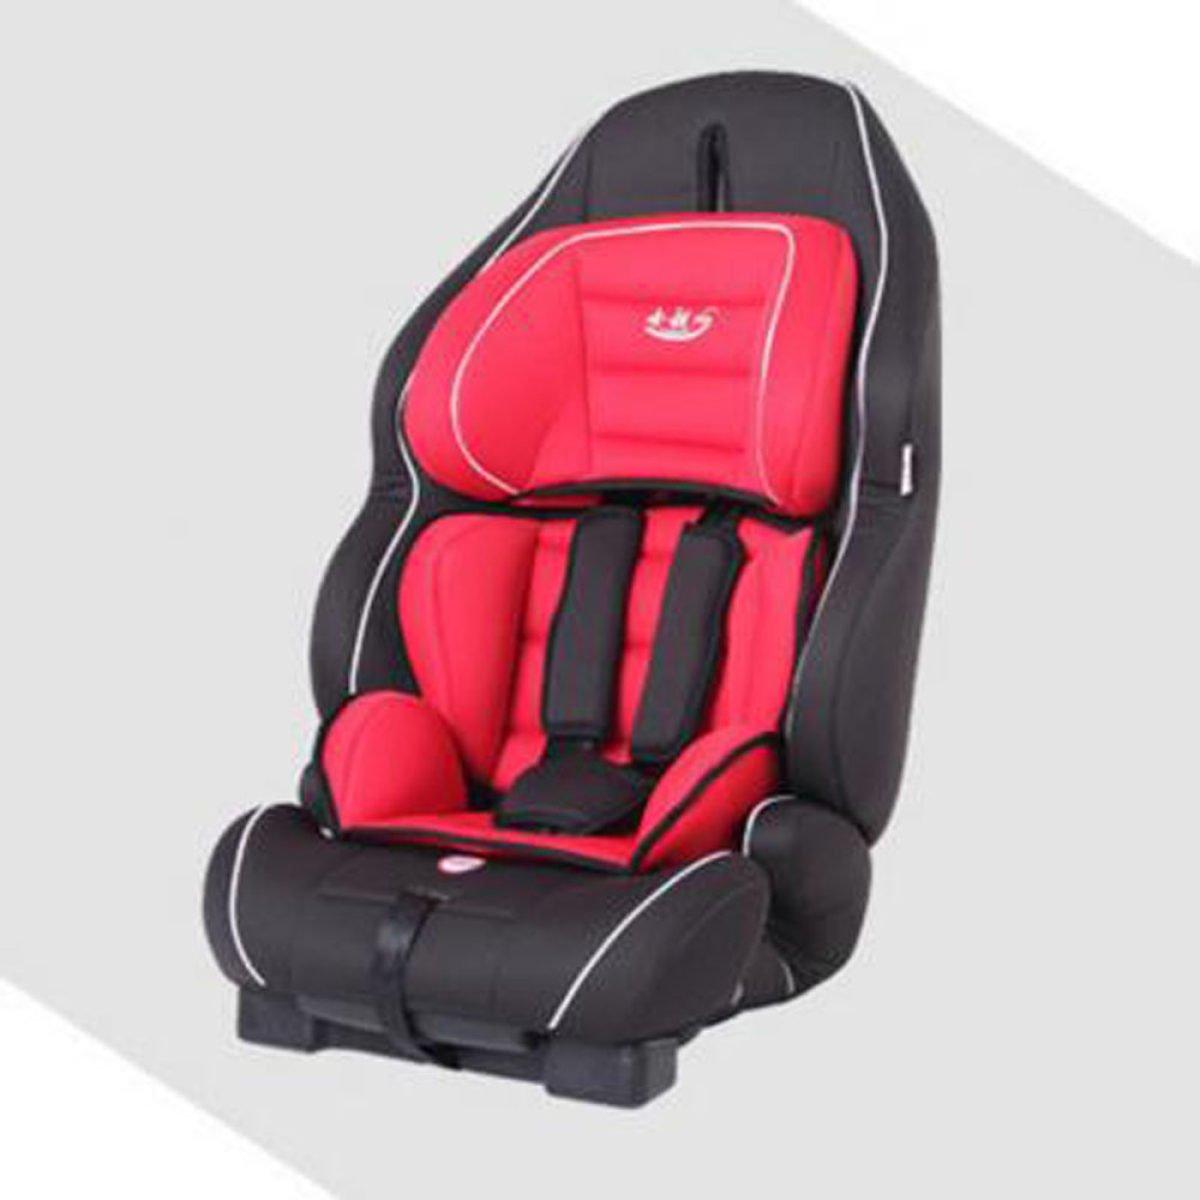 Kinder-Autositz Autositz,C